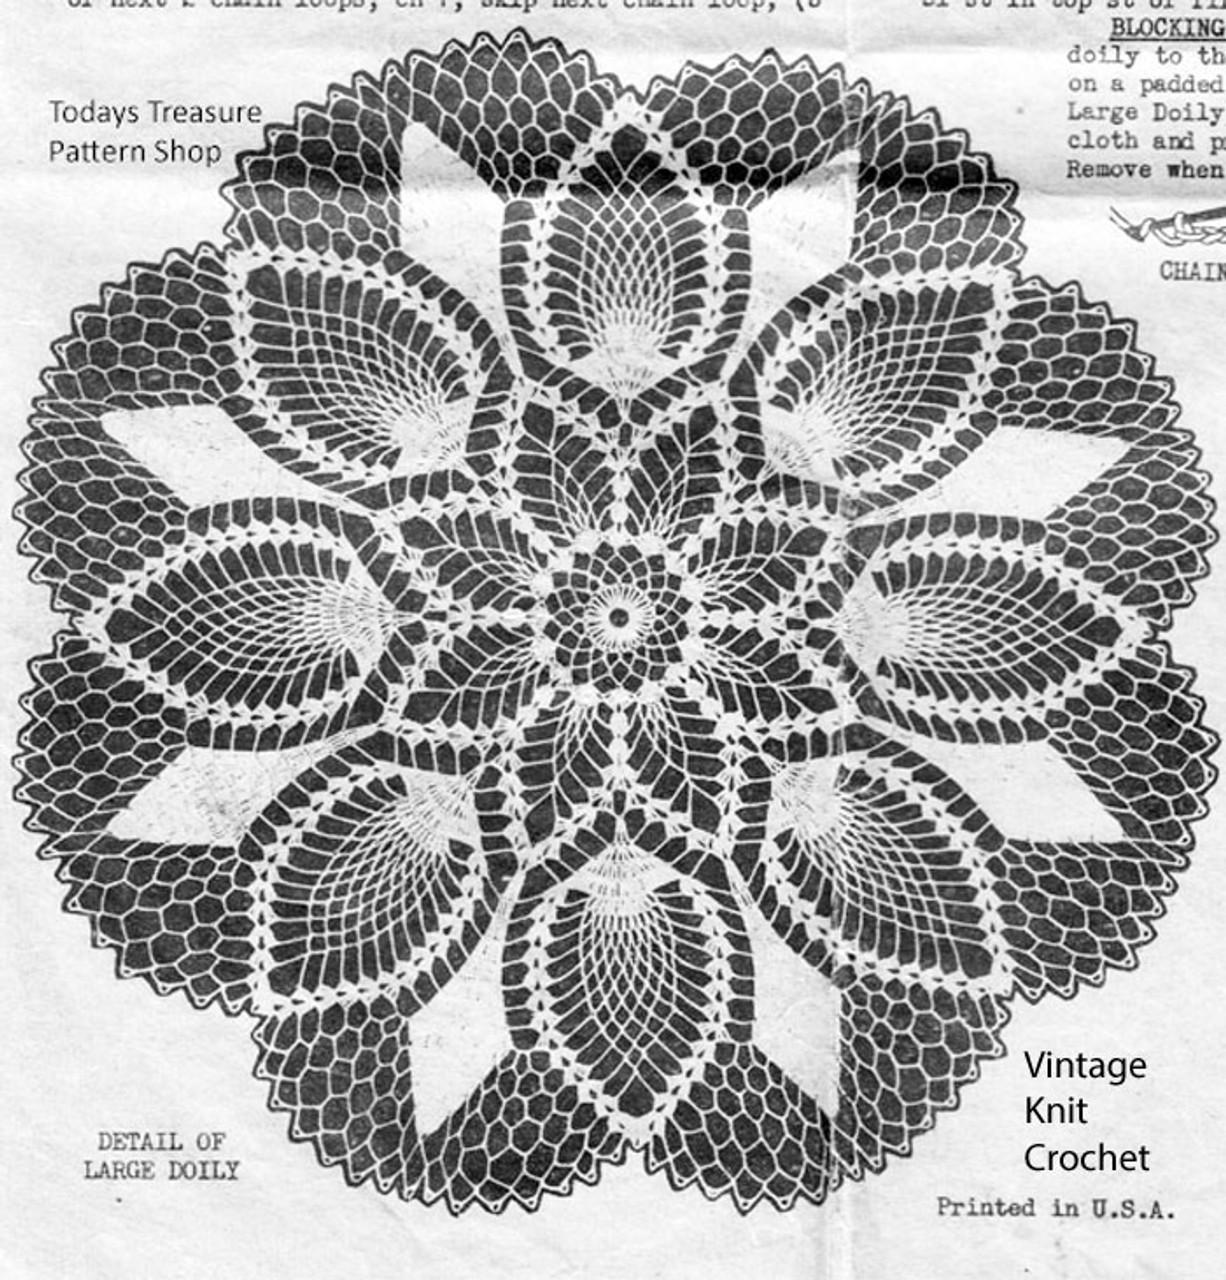 Vintage Mail order pineapple doily illustration for Design 2608